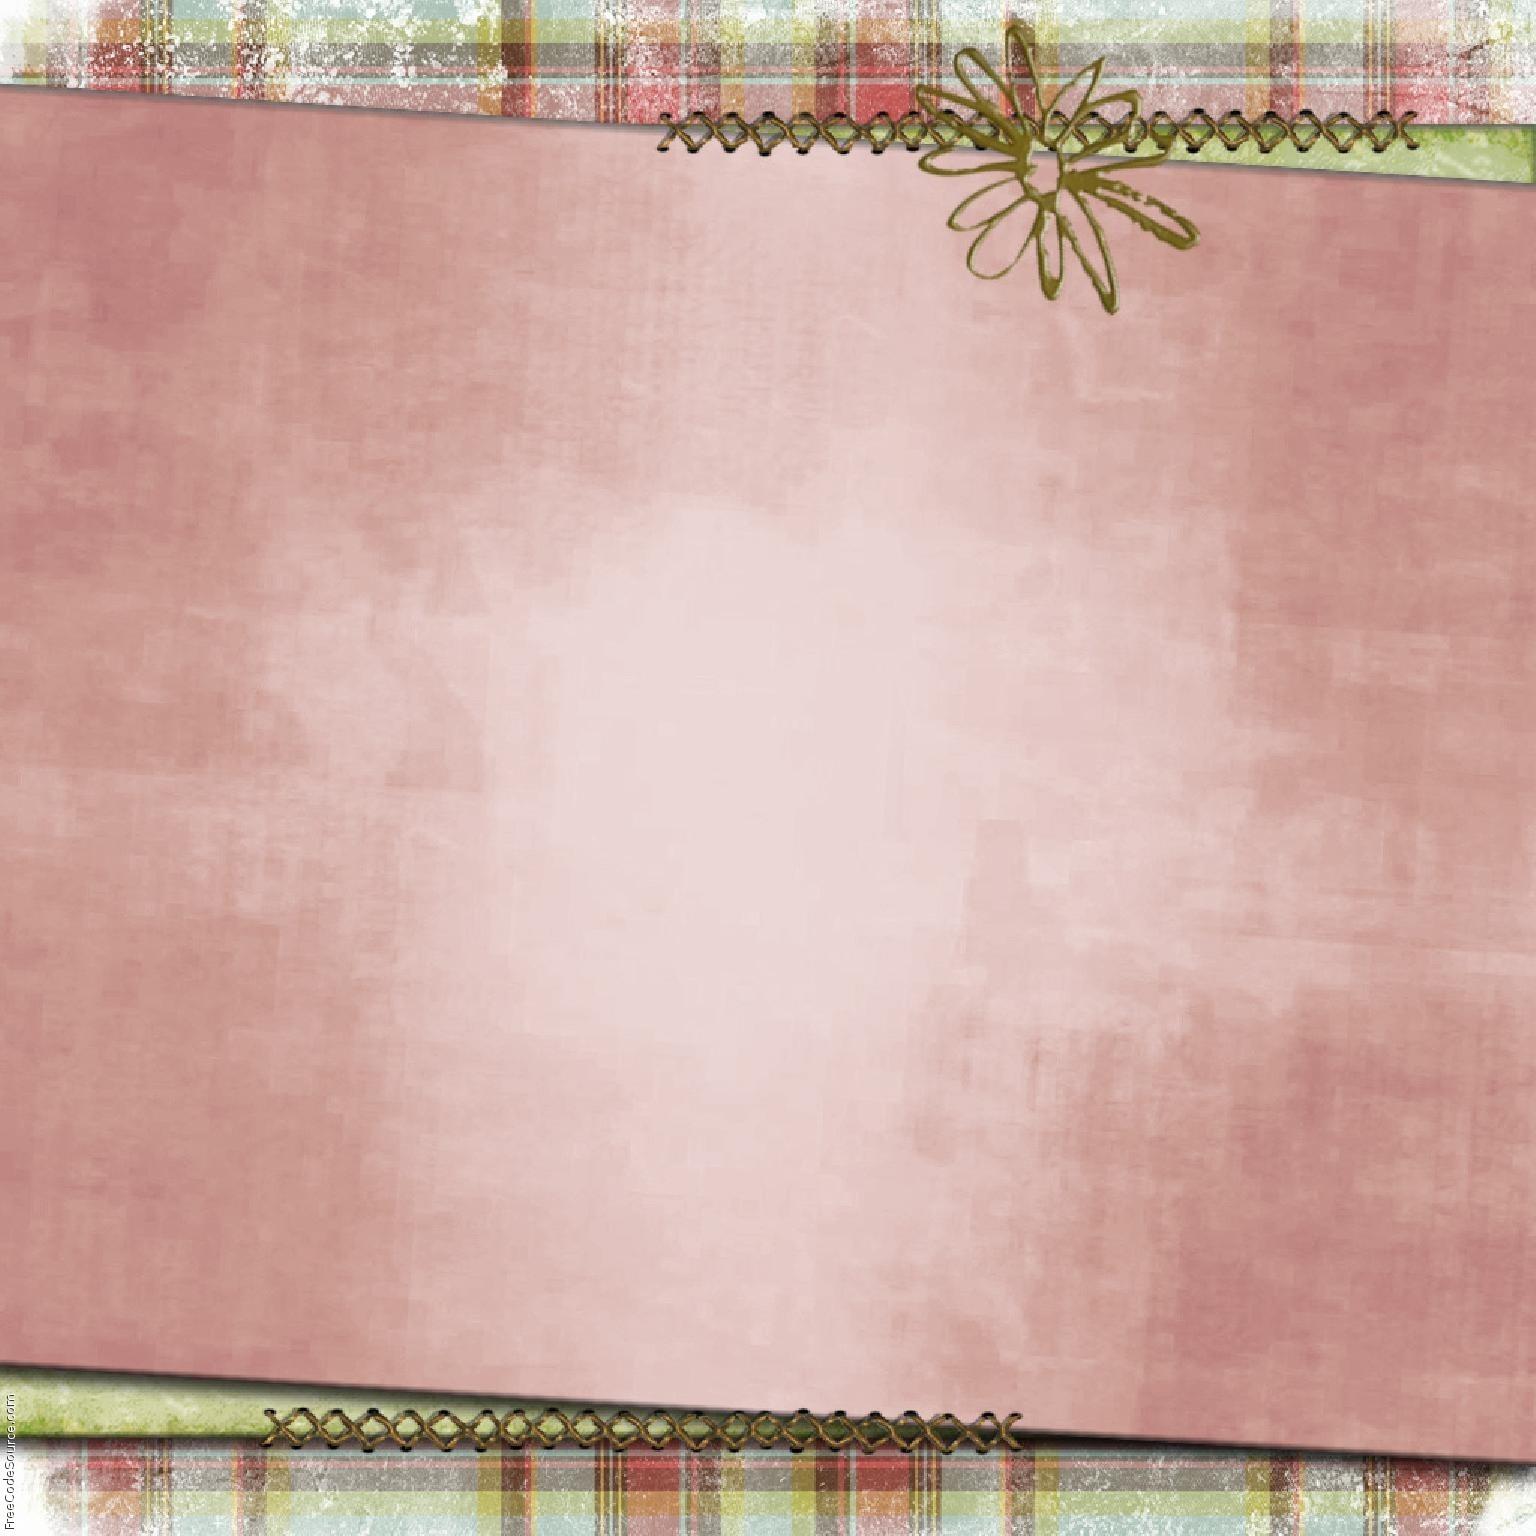 wallpapersplaid n plain formspring backgrounds plaid n plain 1536x1536